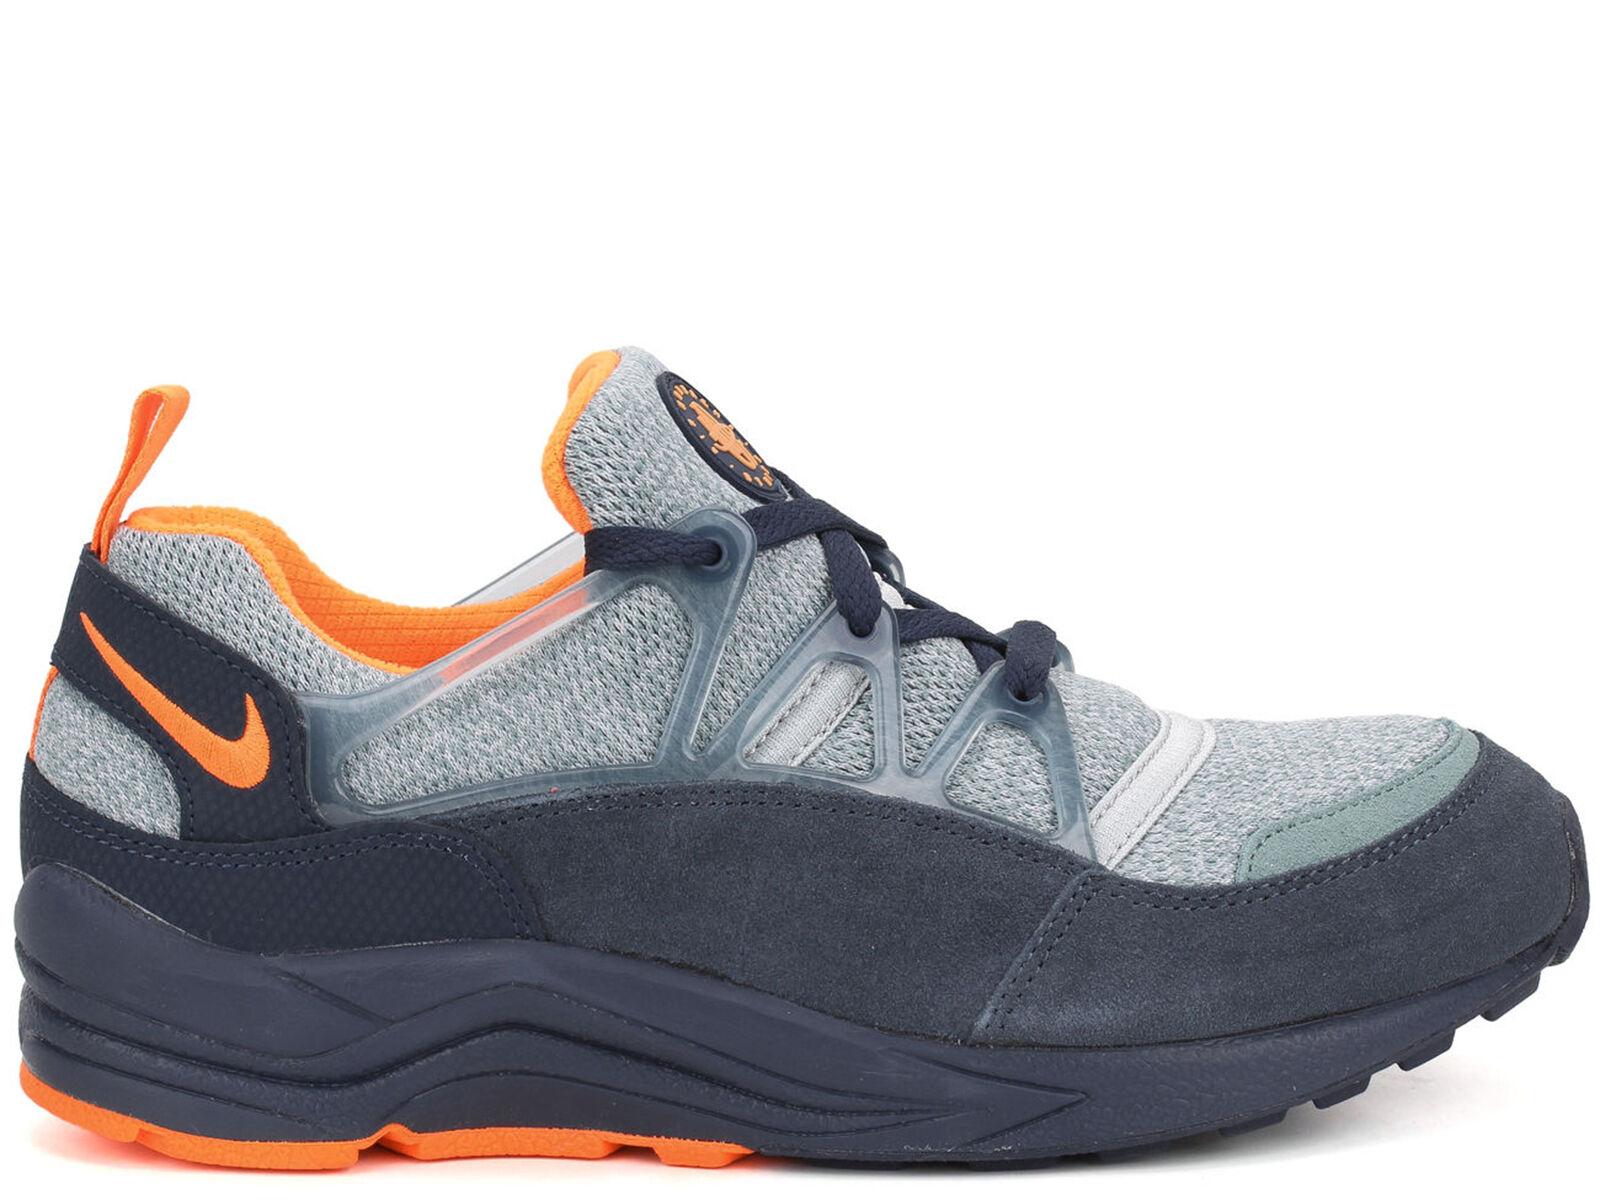 Men's Brand New Nike Air Huarache Light Athletic Fashion Sneakers